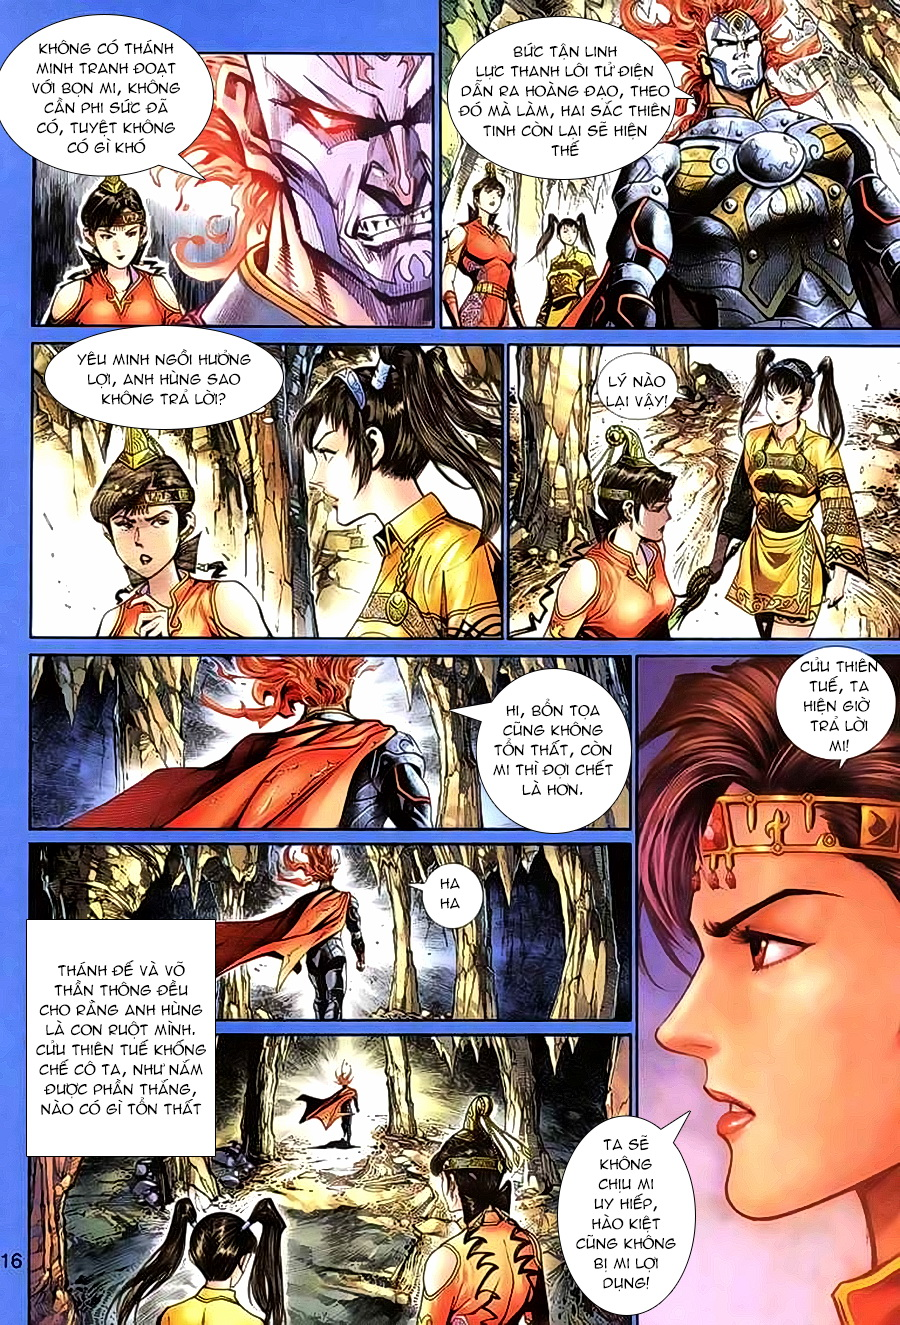 Thần binh huyền kỳ 3 - 3.5 Chapter 65 - Hamtruyen.vn